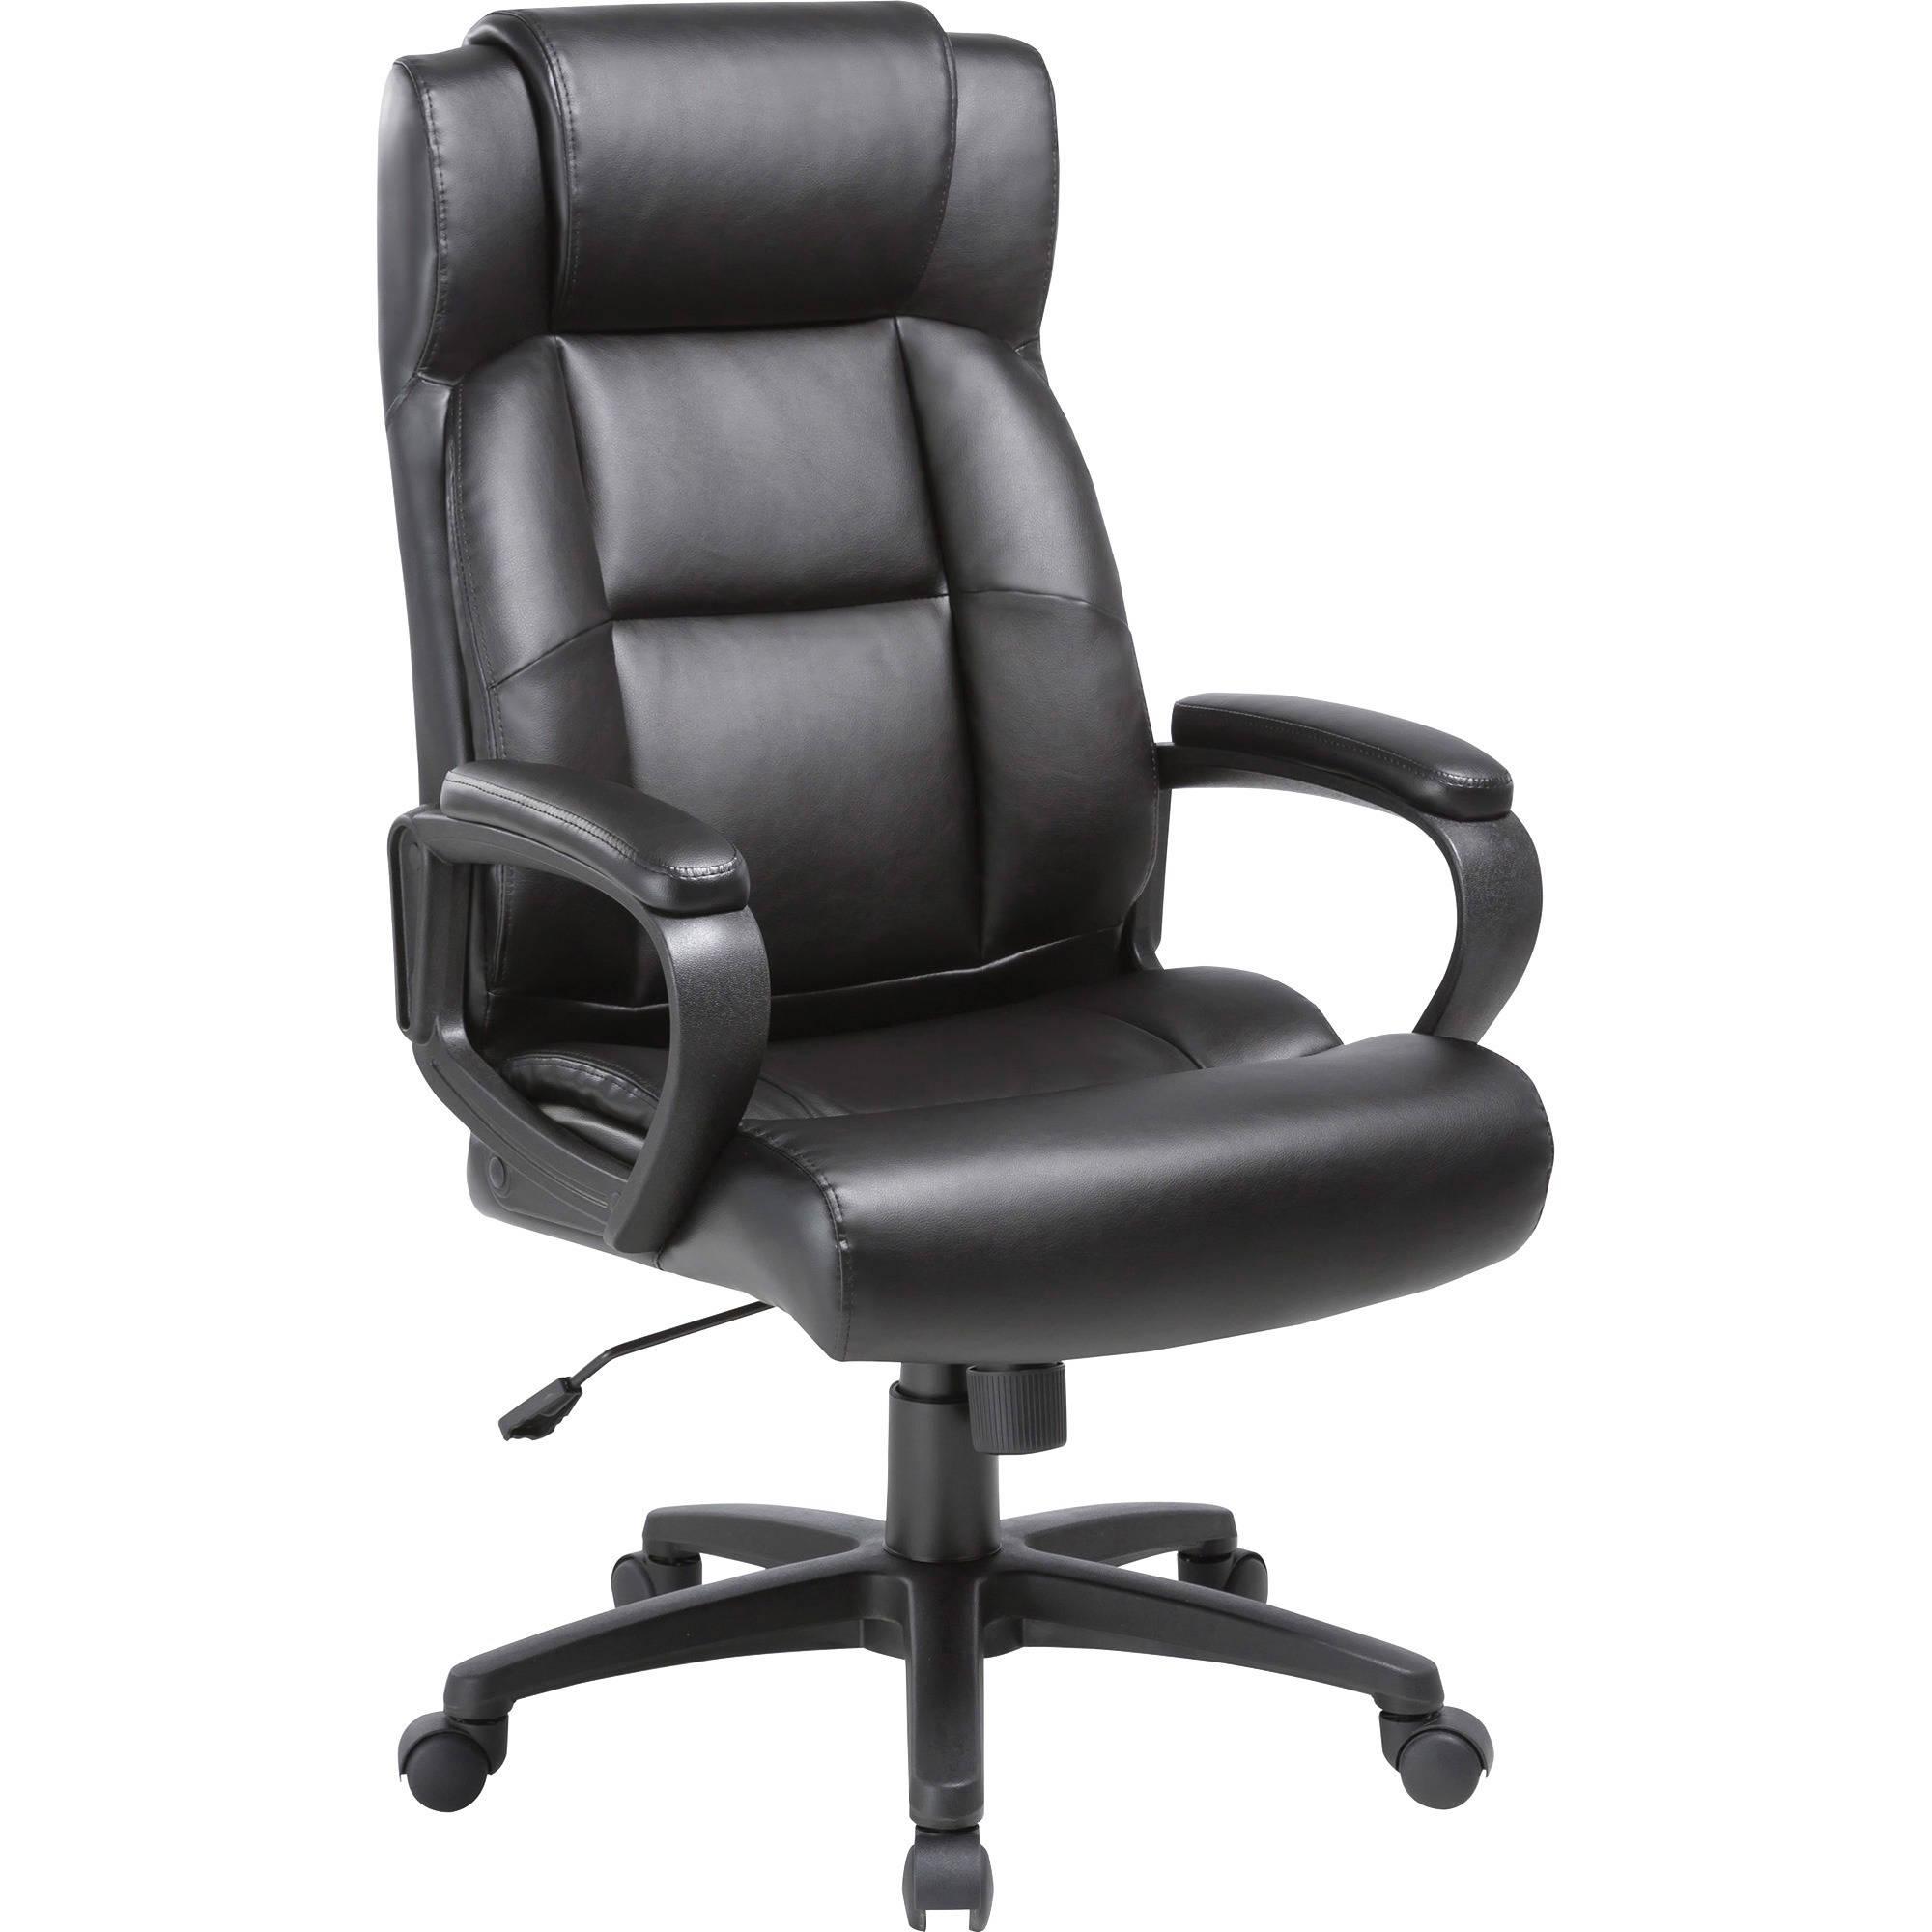 Lorell Soho High Back Leather Executive Chair Llr41844 B H Photo